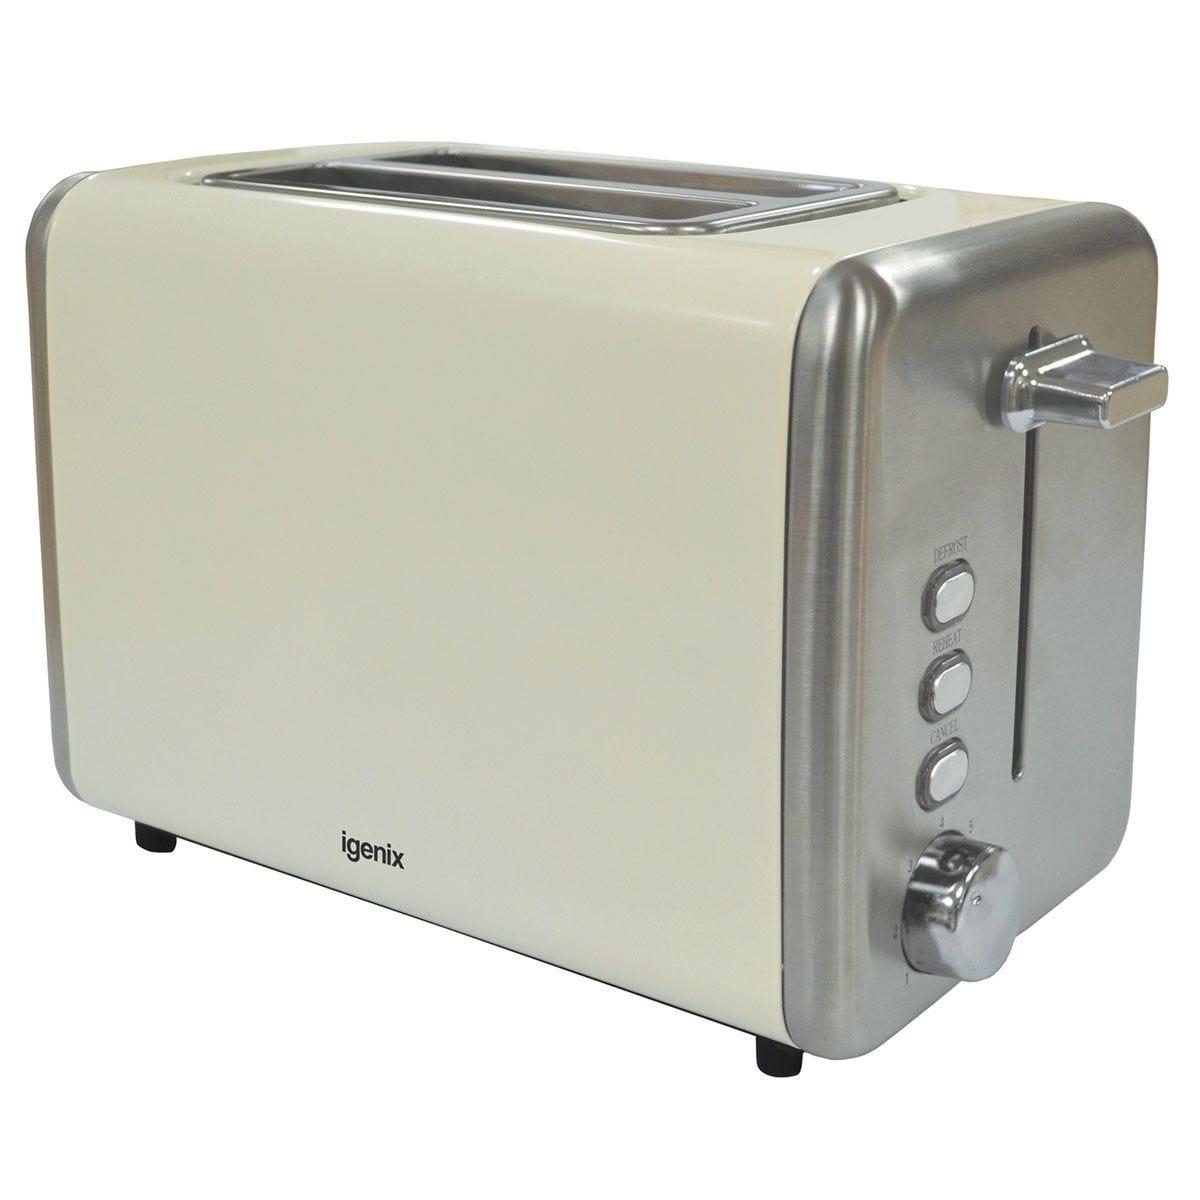 Igenix IG3000C 2–Slice Deep Slot 850W Stainless Steel Toaster – Cream